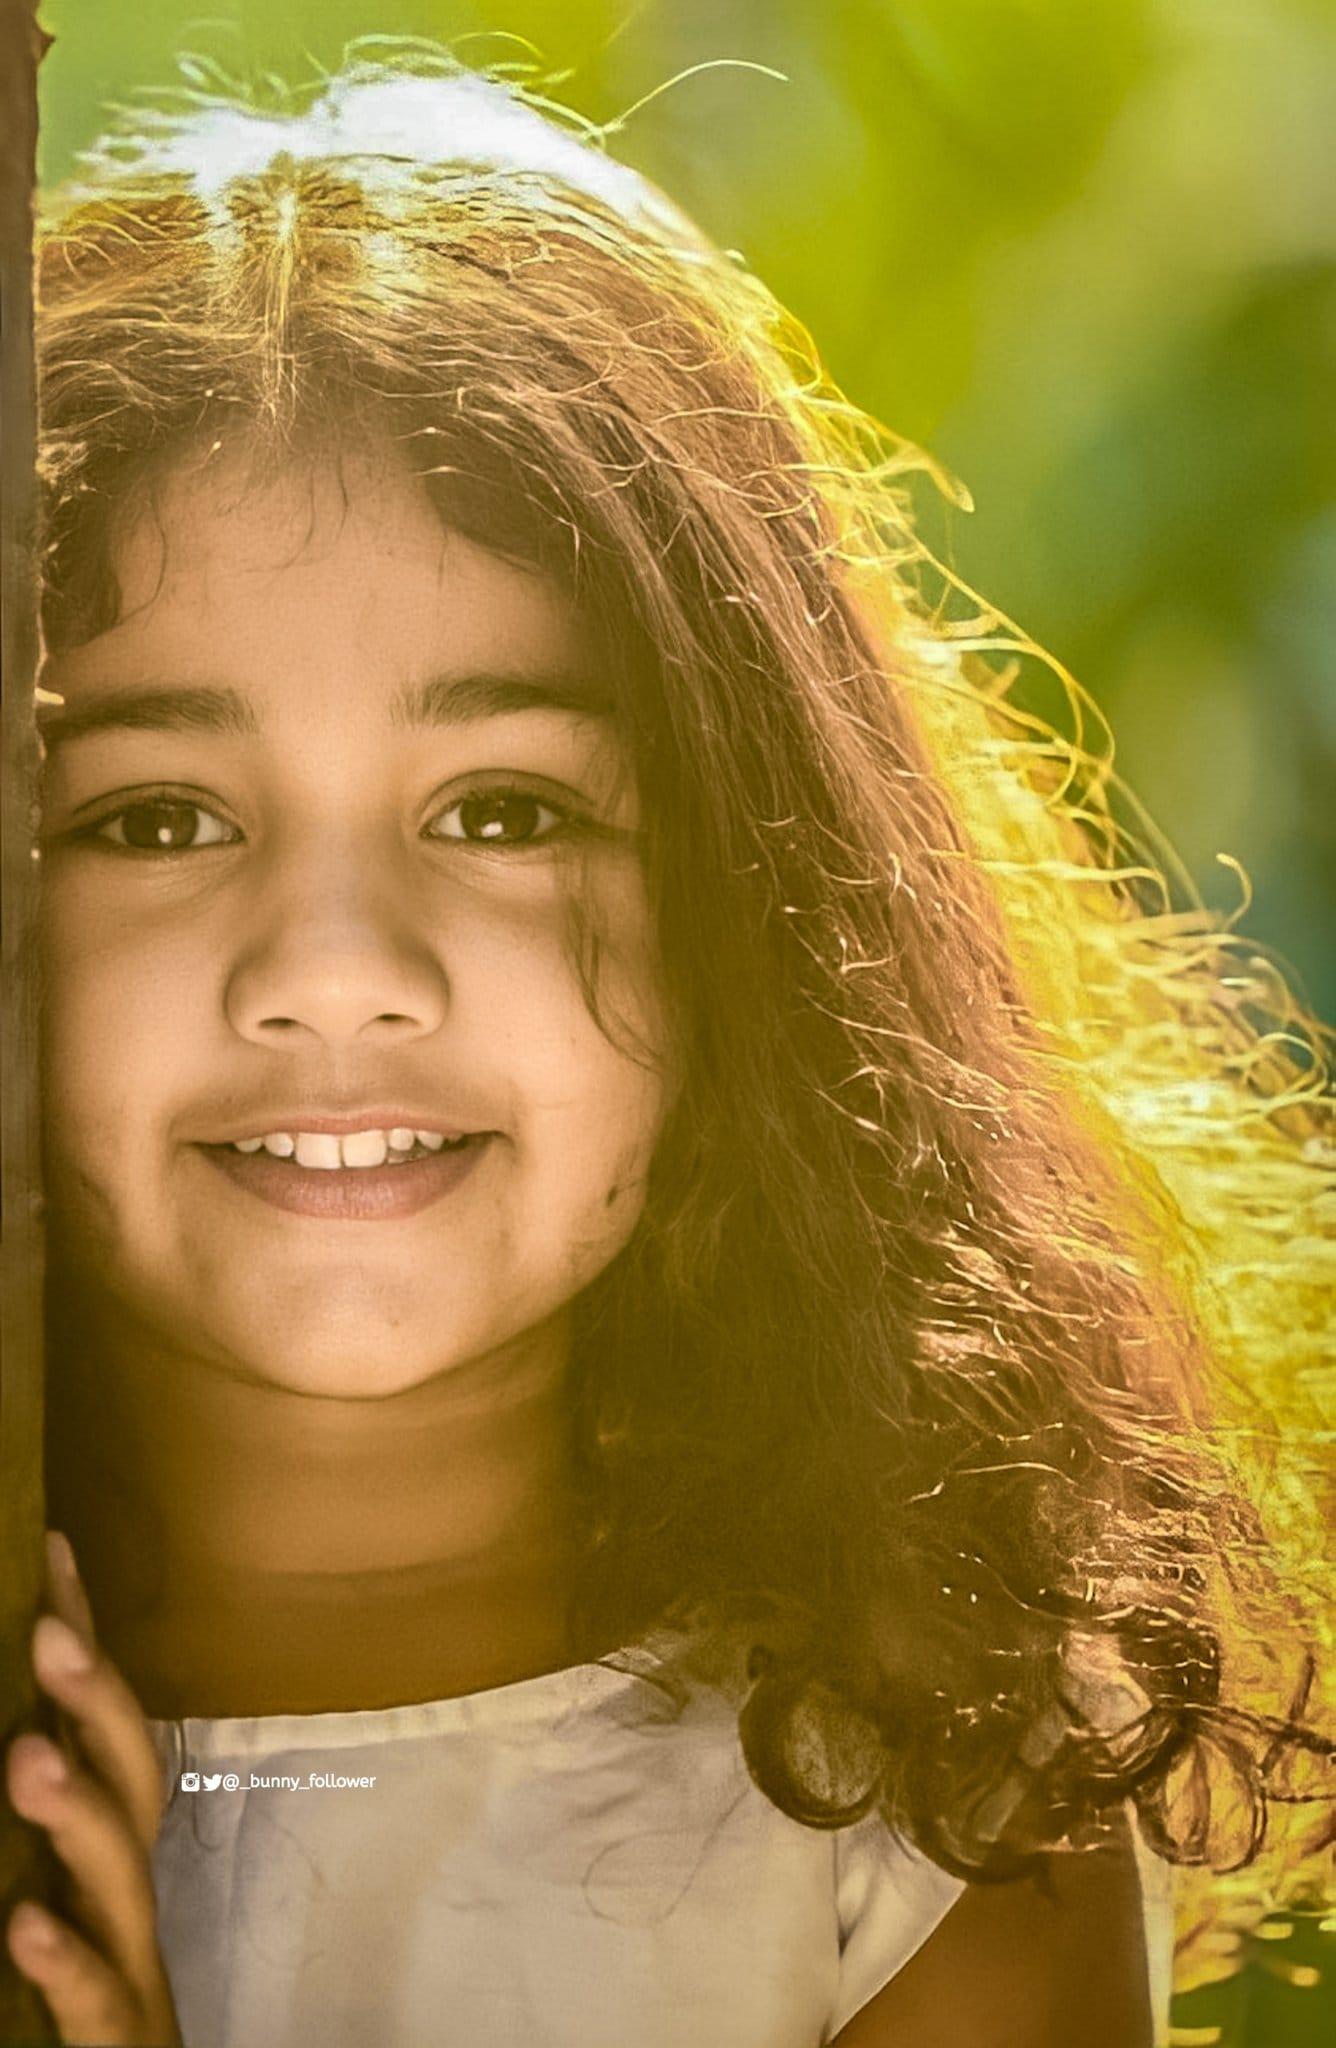 Allu Arjun | Arha : అల్లు అర్జున్ గారాల పట్టి అర్హ సూపర్ క్యూట్ పిక్స్.. Photo : Instagram